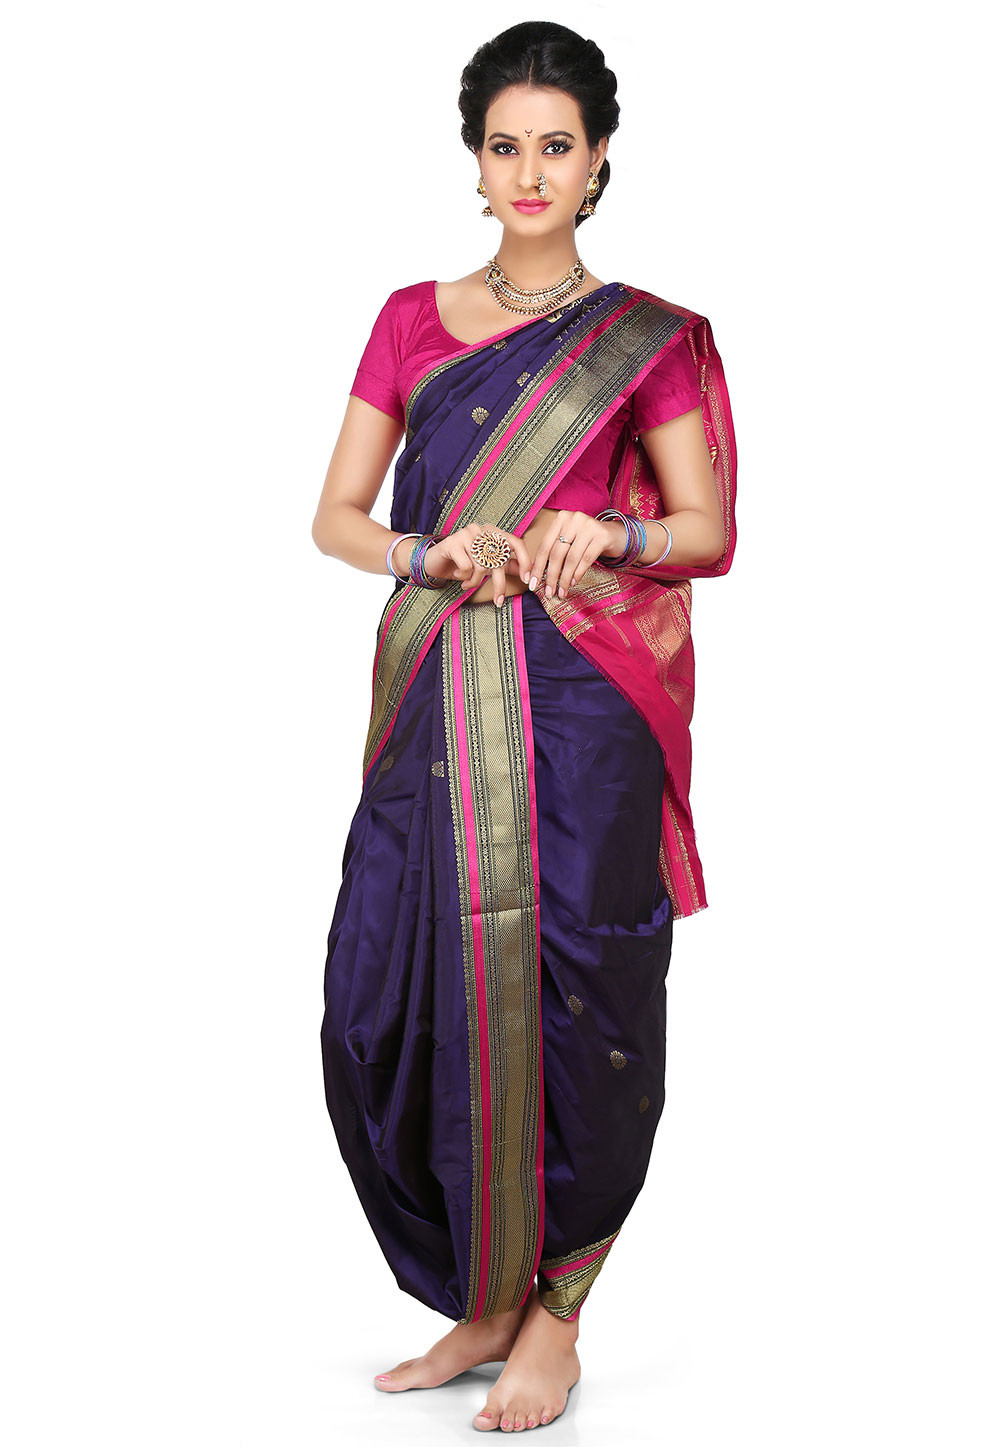 Nauvari Sarees 9 Yards Saree From Maharashtra Utsavpedia